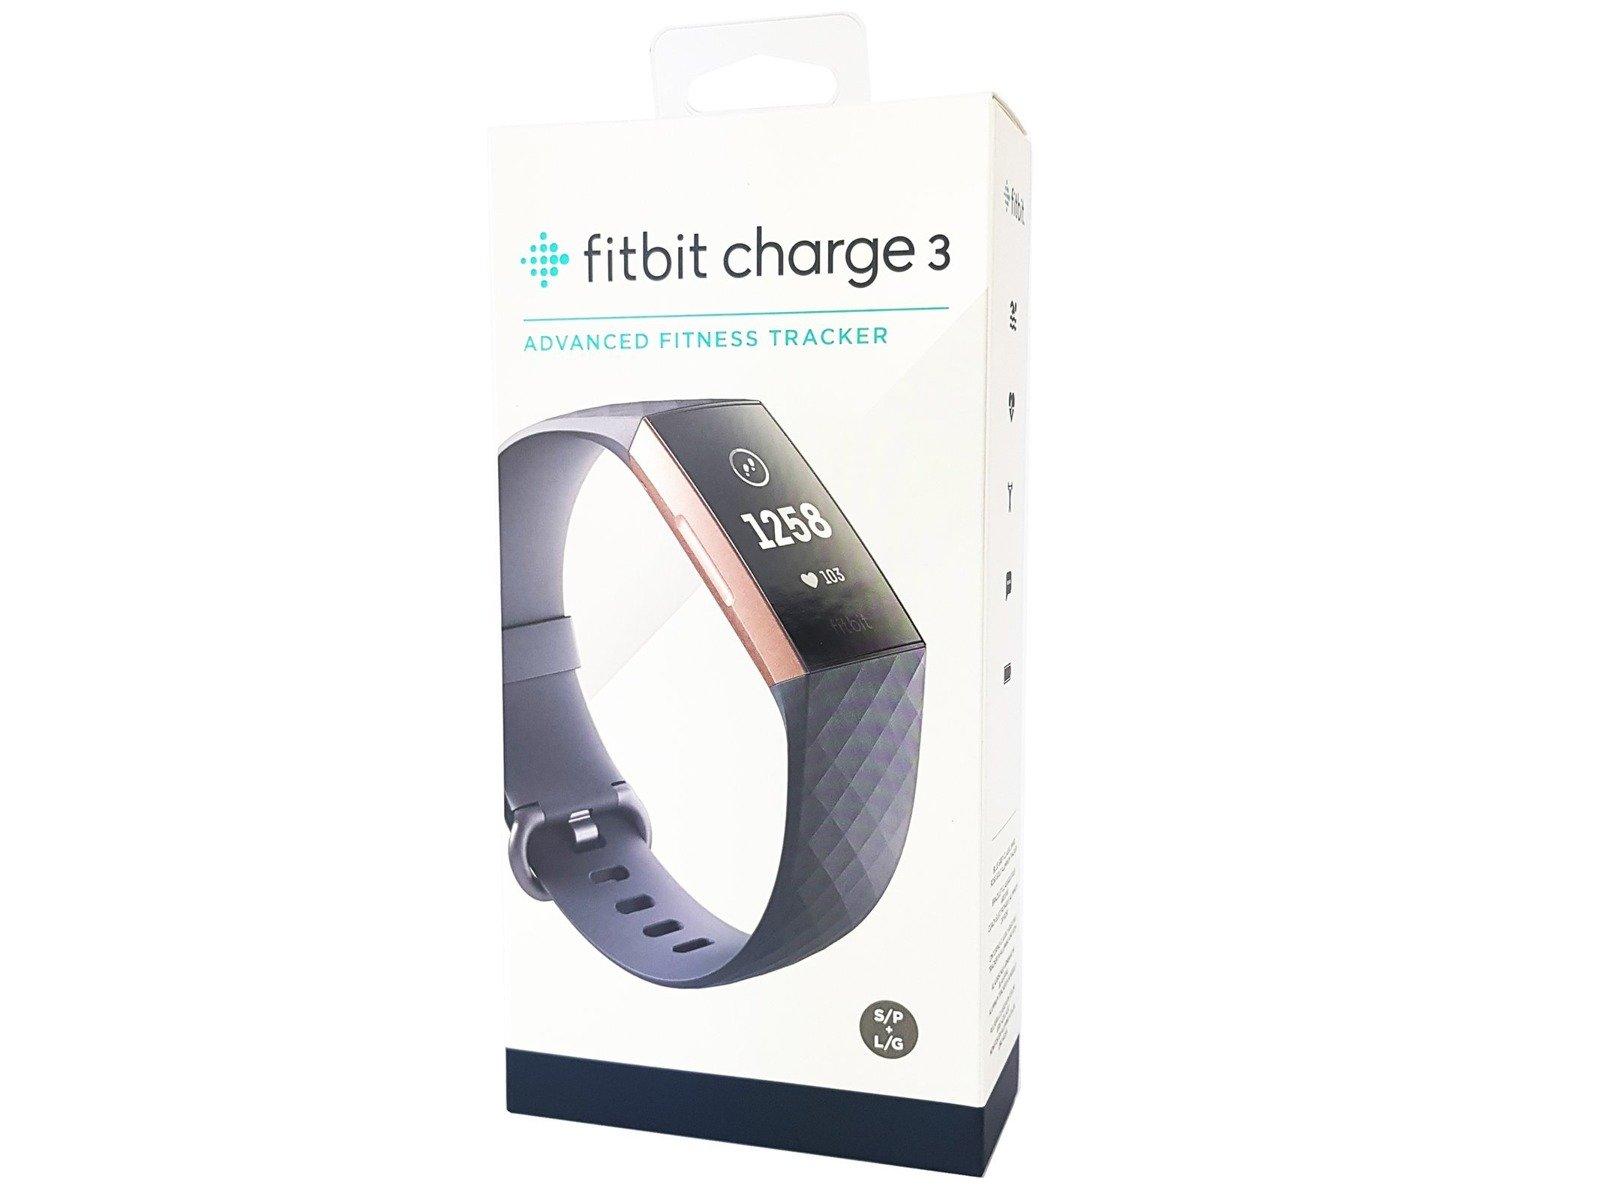 Neu OVP Fitbit Charge 3 Smartband Tracker Rose Gold / Blue Grey